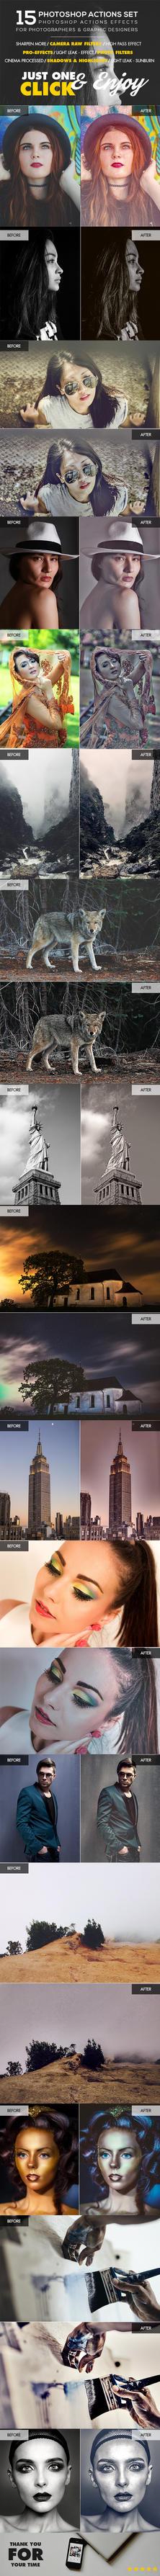 15 Photoshop Actions SET by Hz-designer